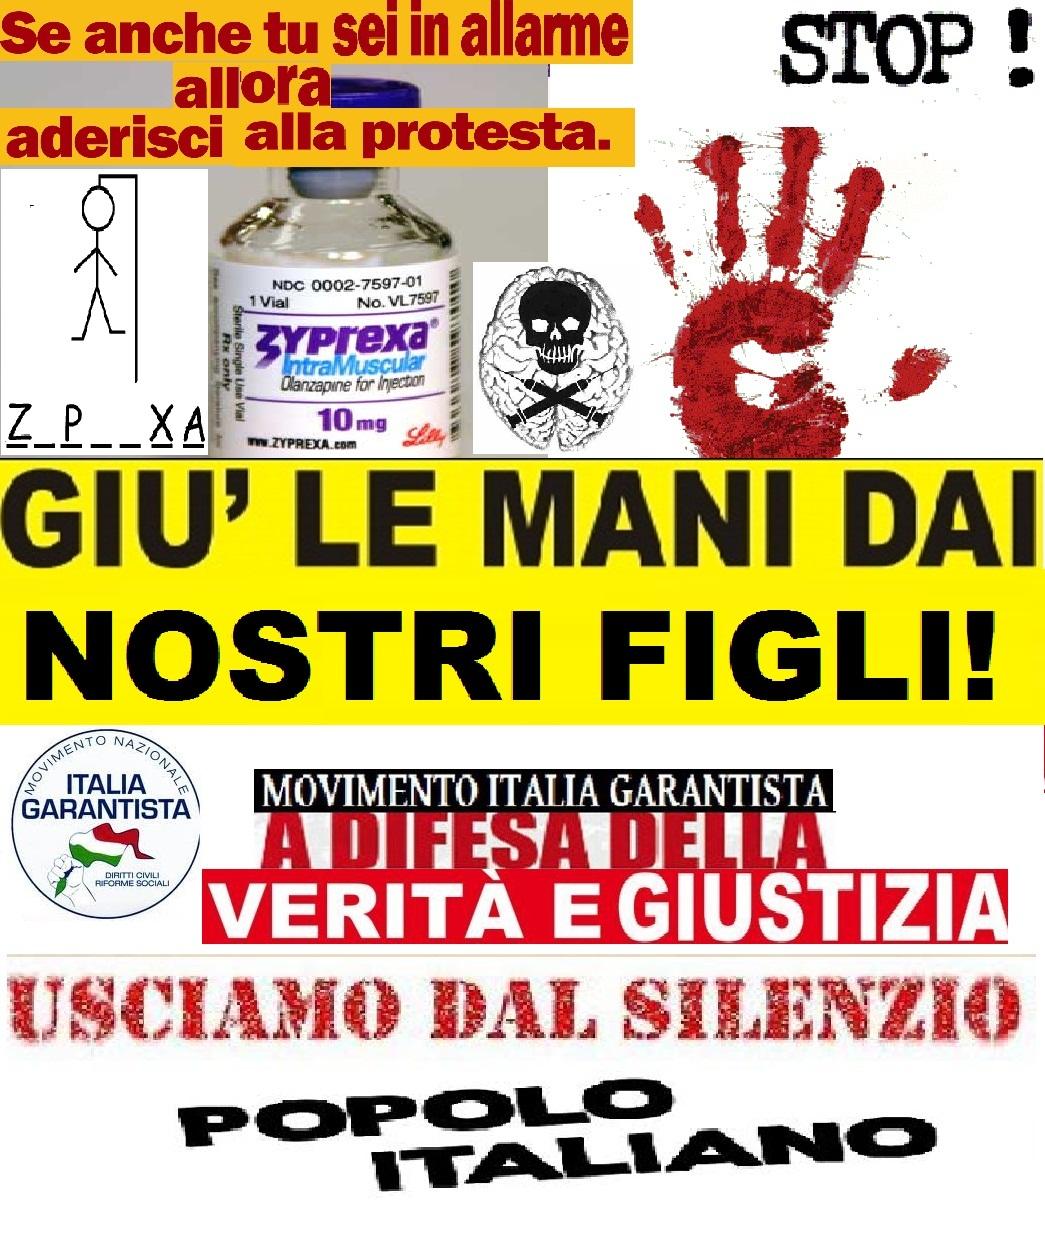 viareggio single men Varicocele embolization with glue and coils: a single  has reported a higher incidence of 25% in men with abnormal sperm  glubran 2 ®, gem, viareggio, .